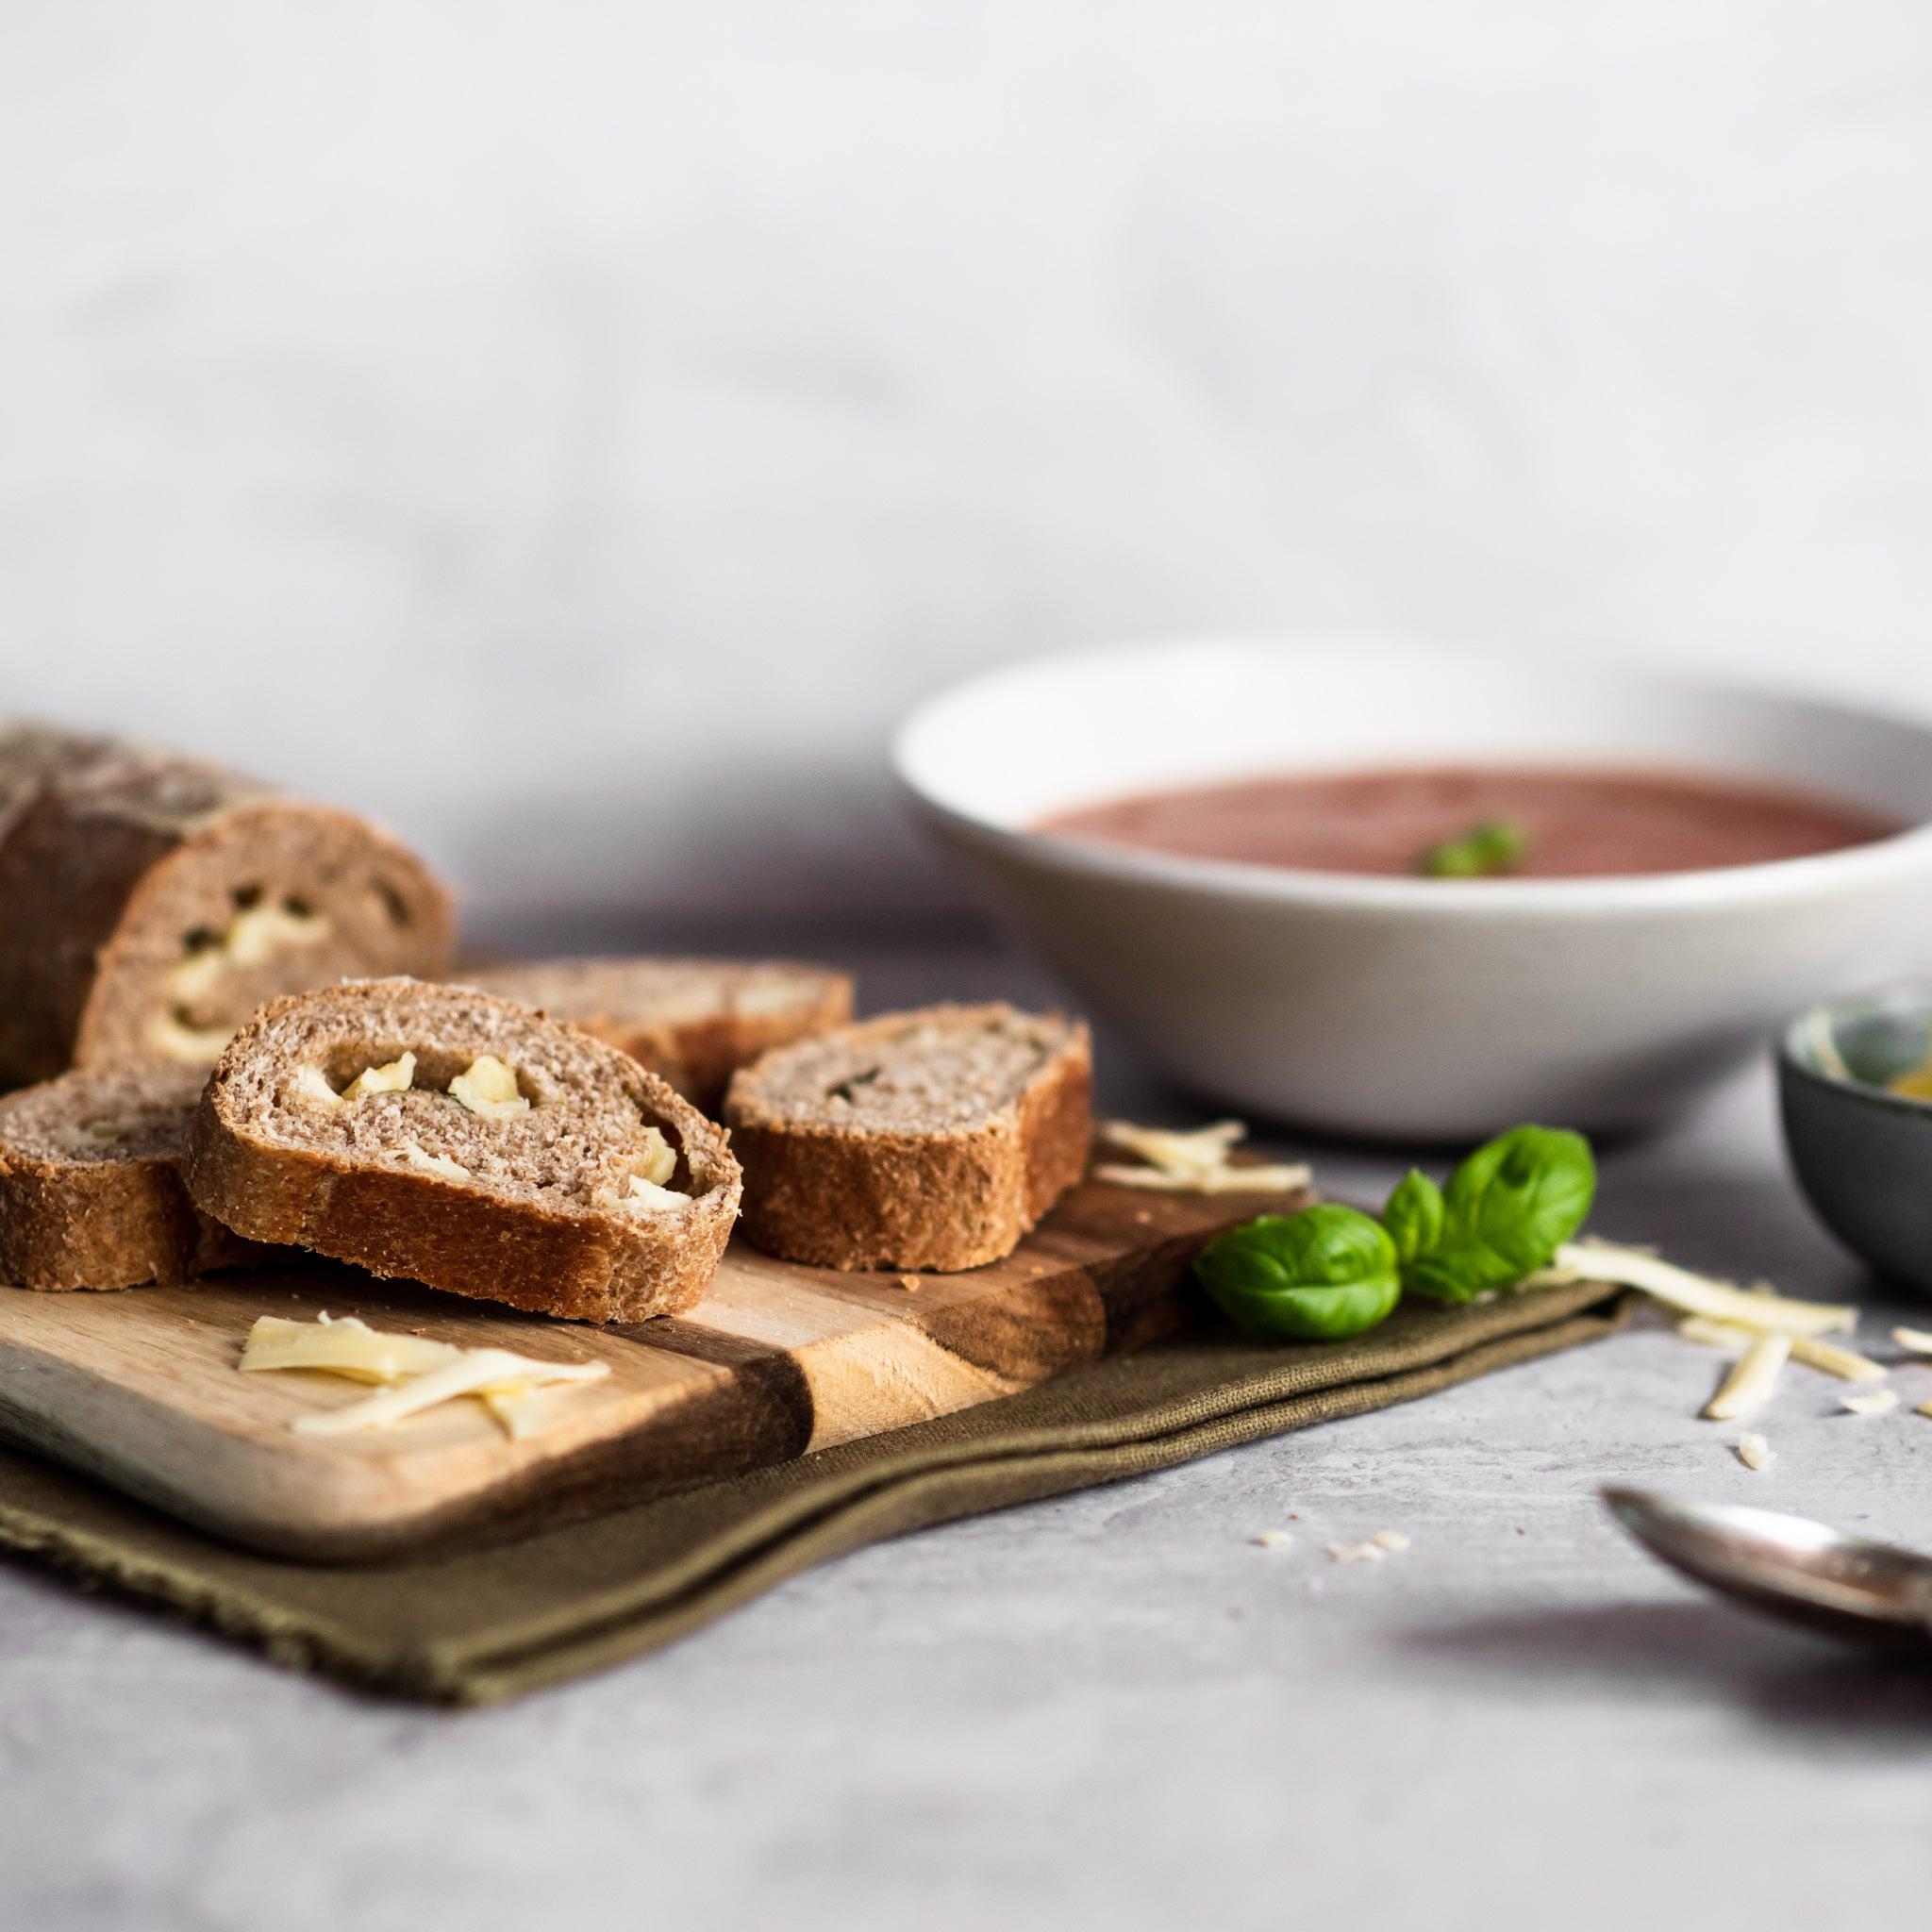 Cheese-and-Basil-Pinwheel-Bread-SQUARE-1.jpg